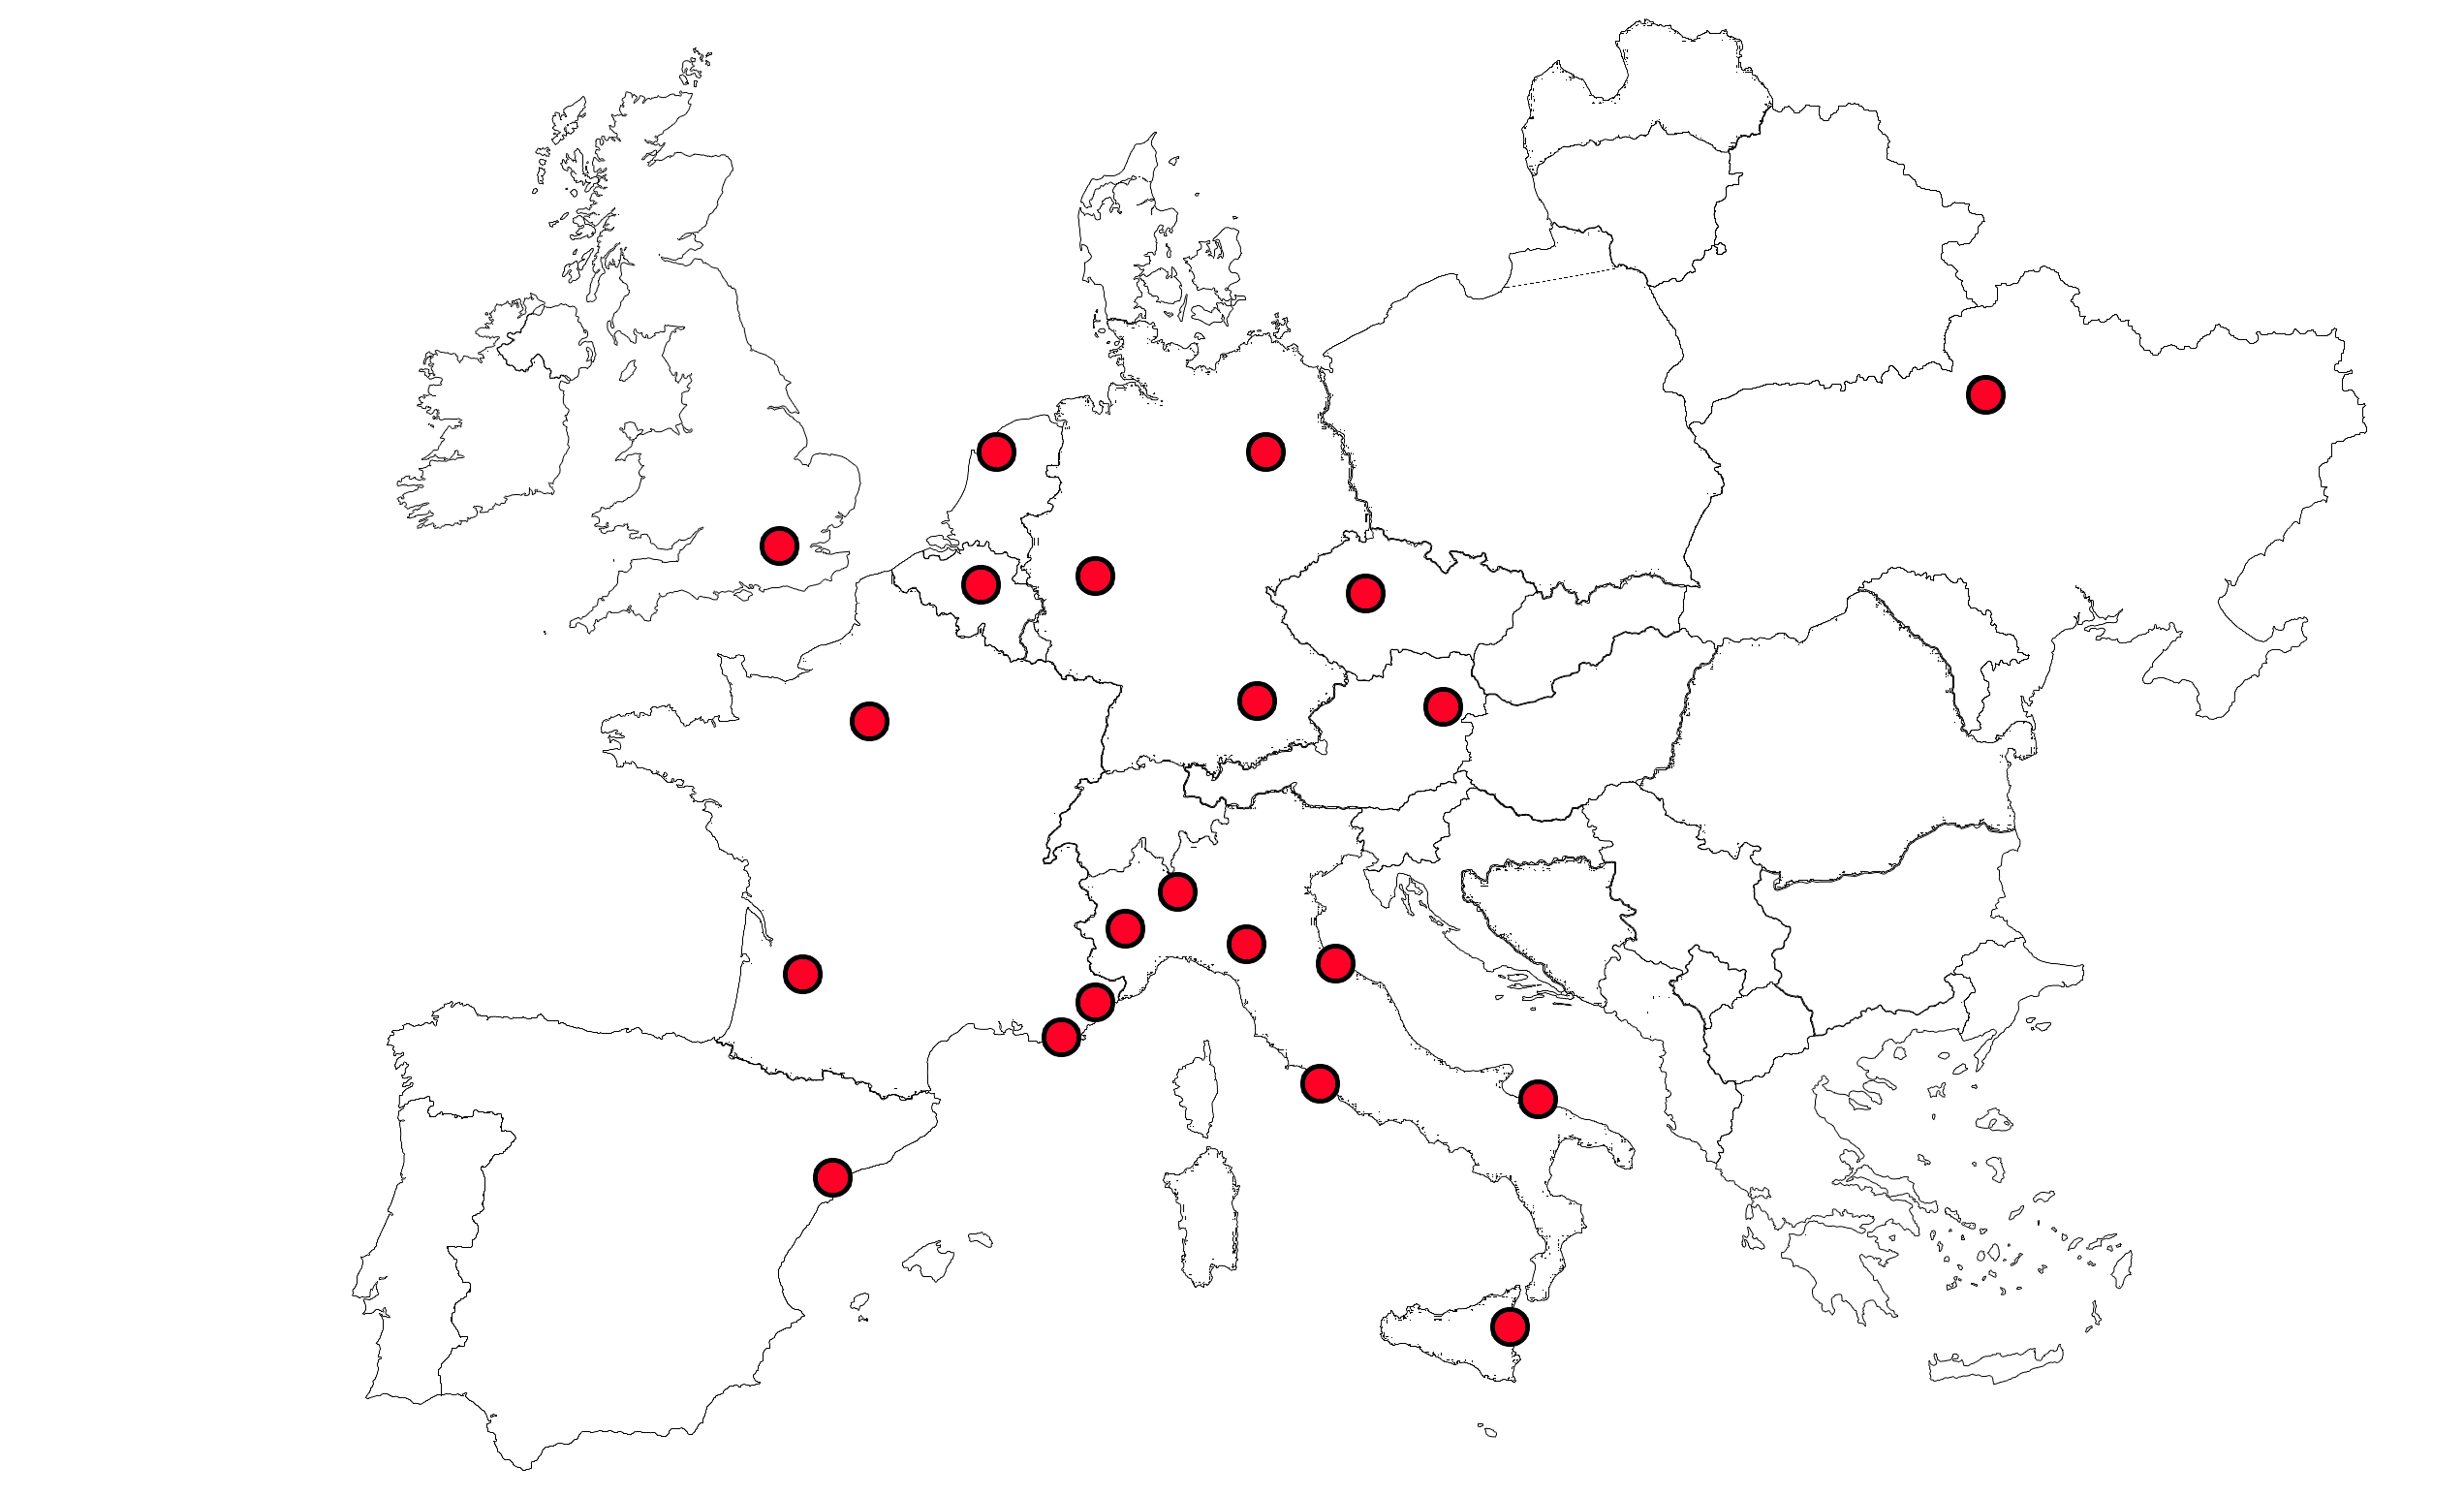 europa con punti